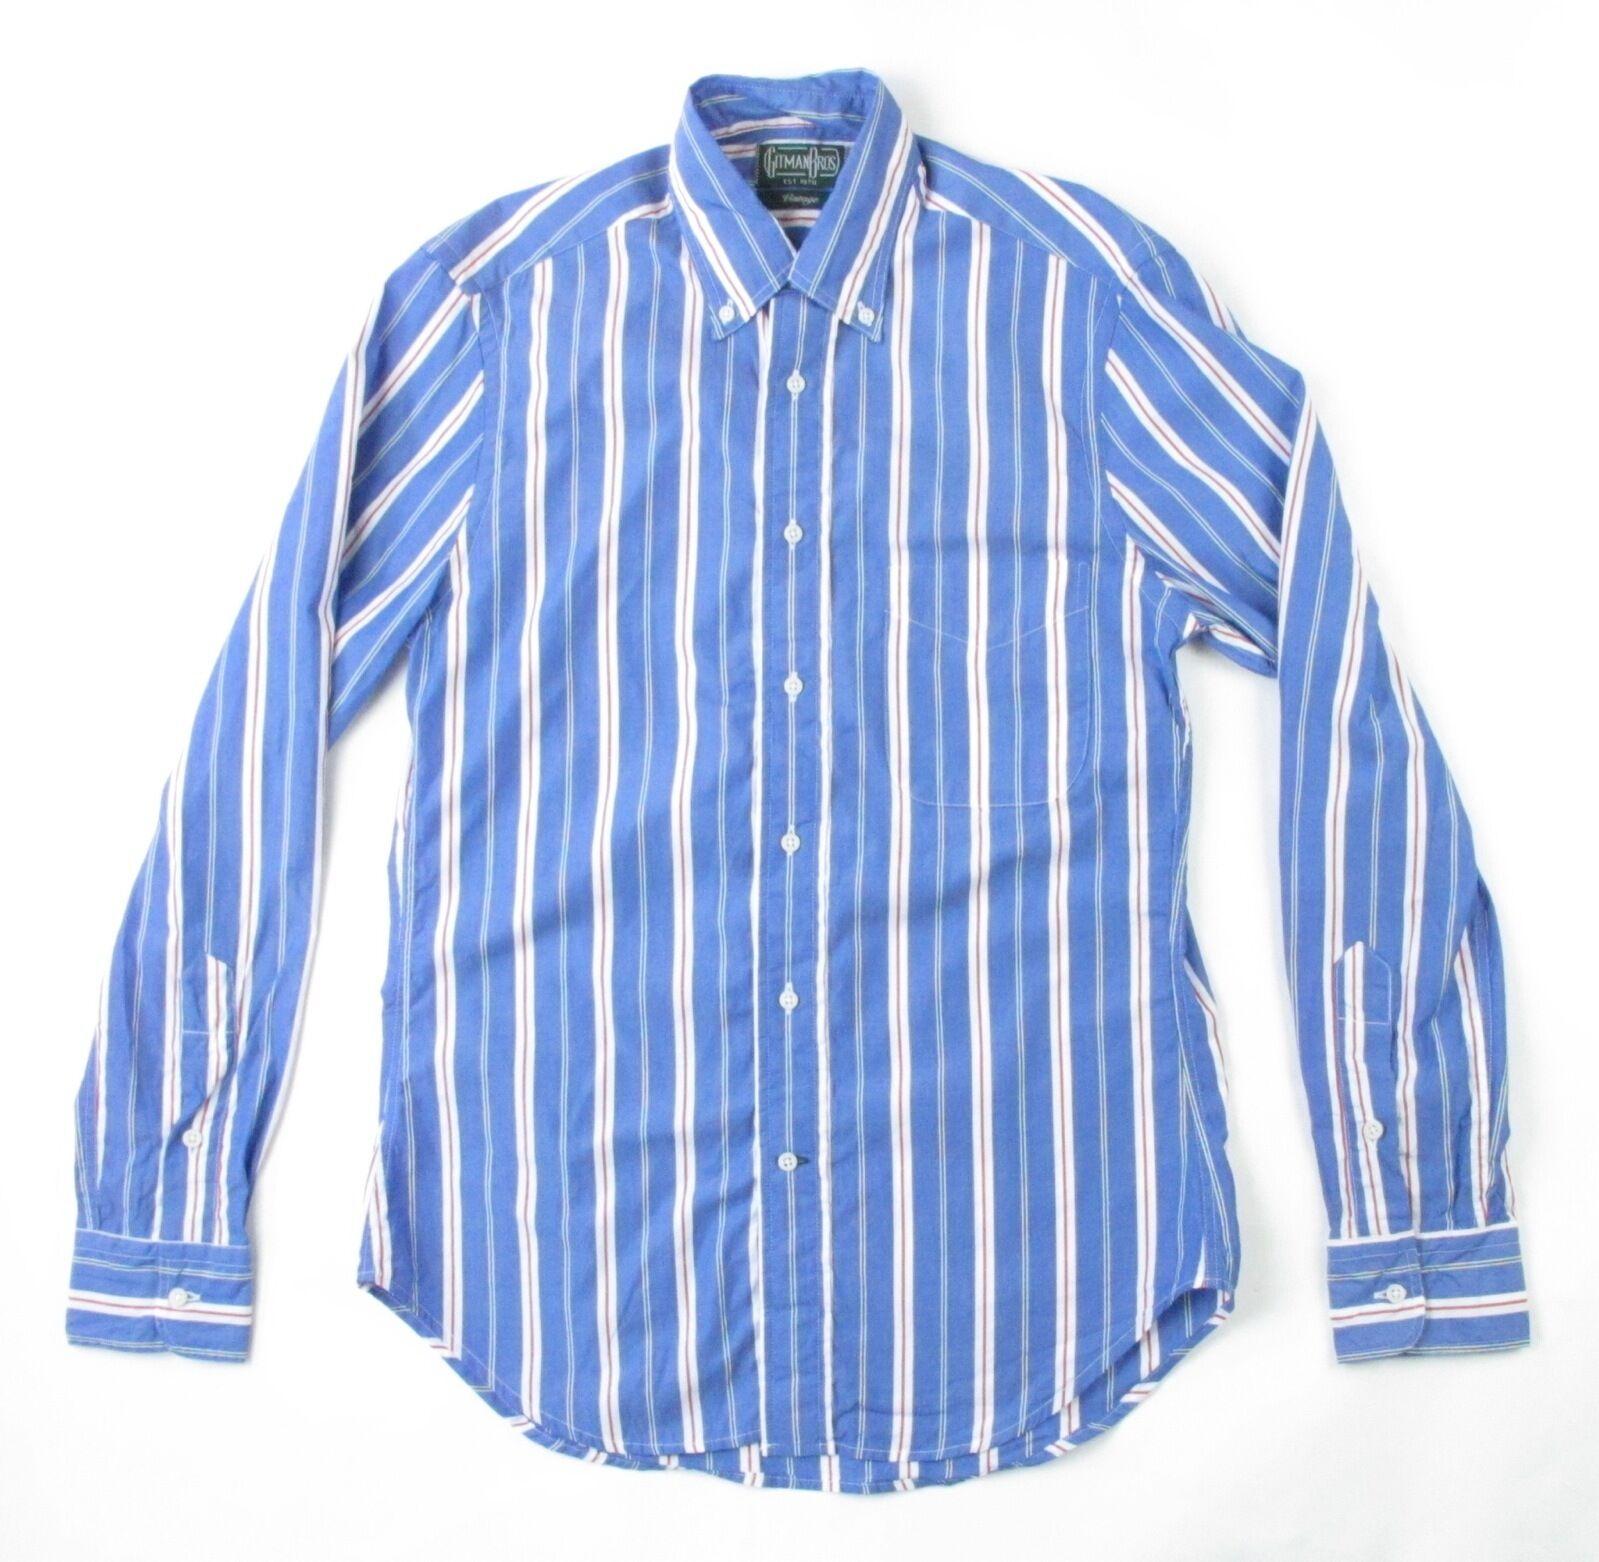 Gitman Vintage Yachting Stripe Shirt bluee S L NWT Retail